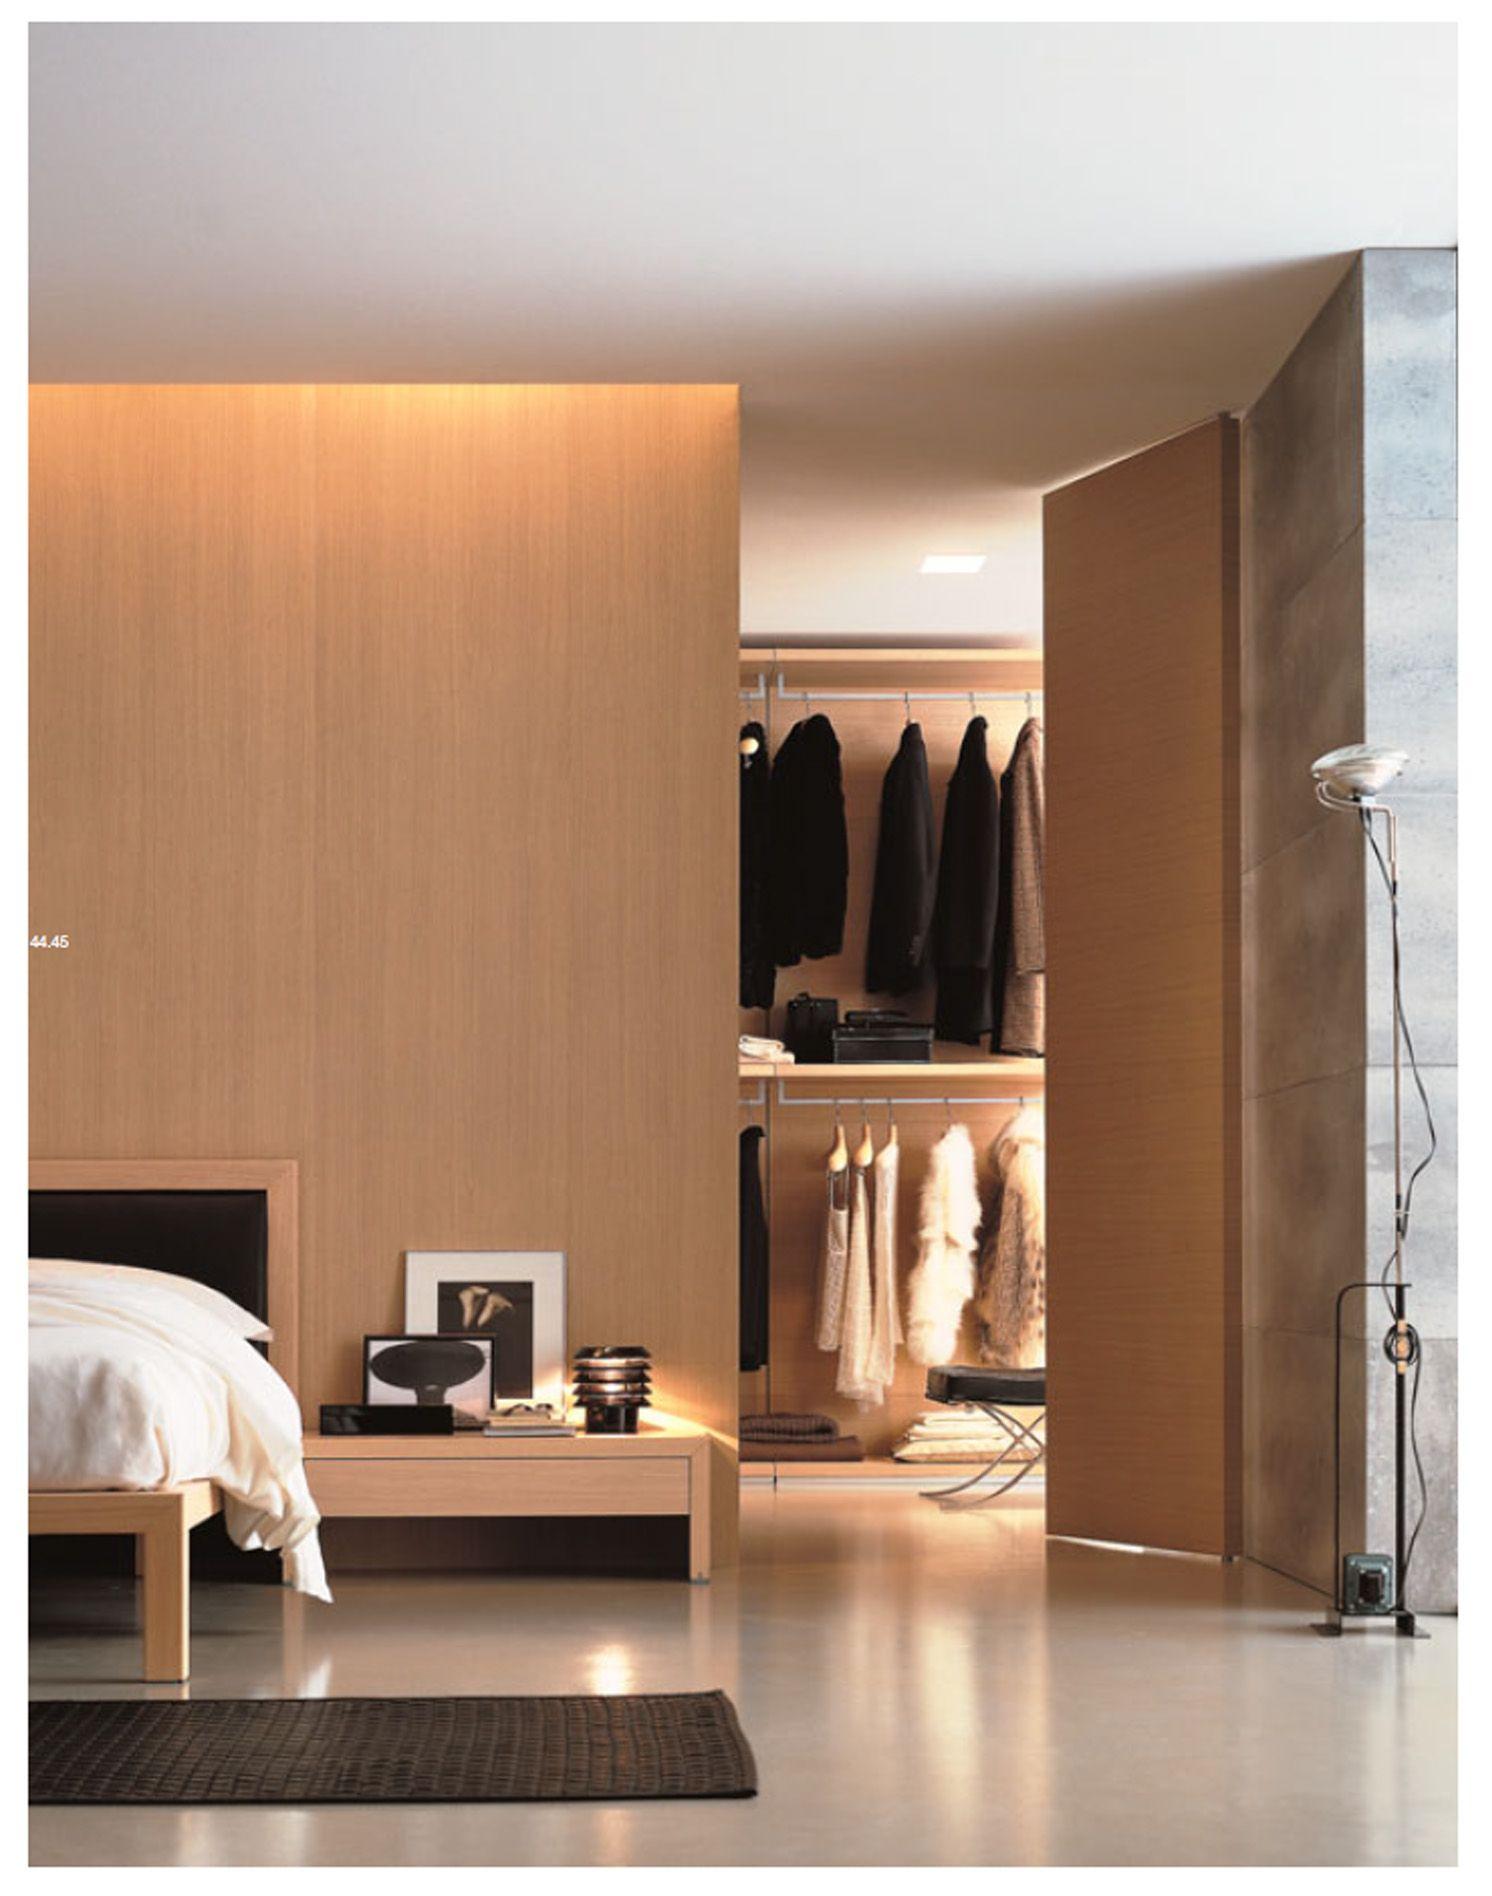 Poliform Closet/ Dressing Room. Secret Door. Cove Light.